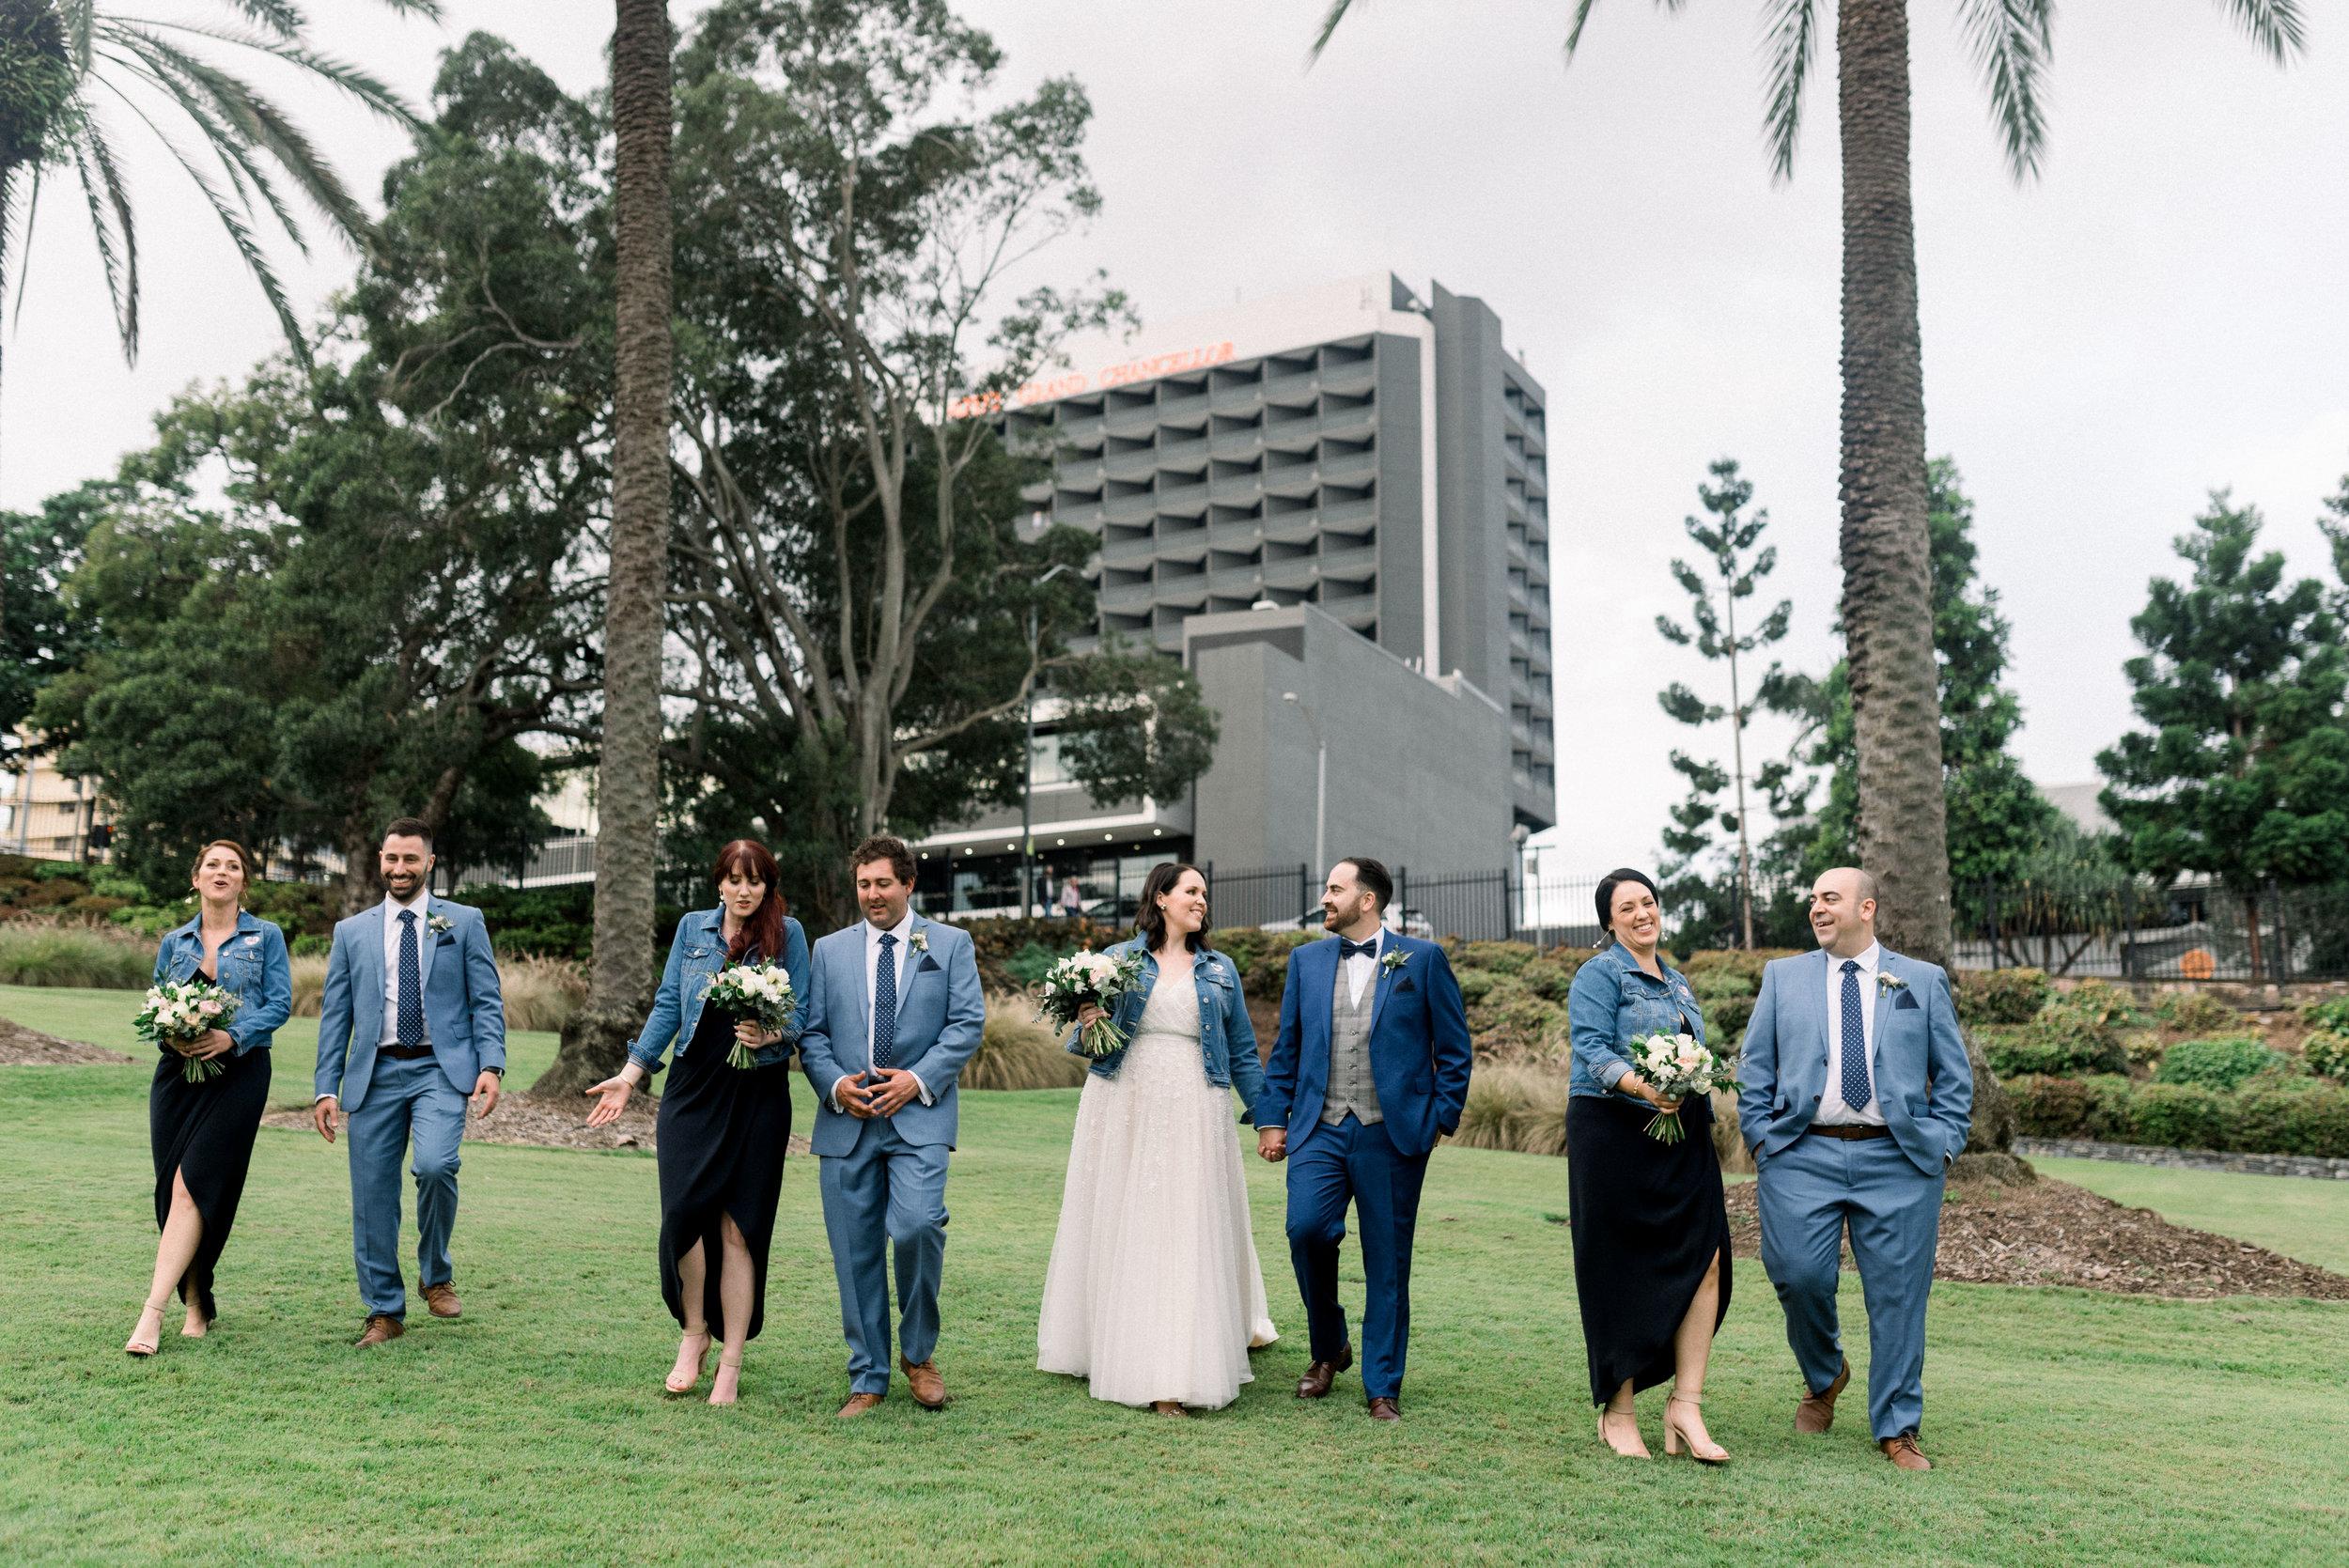 brisbane-city-wedding-photographer-romantic-wedding-77.jpg